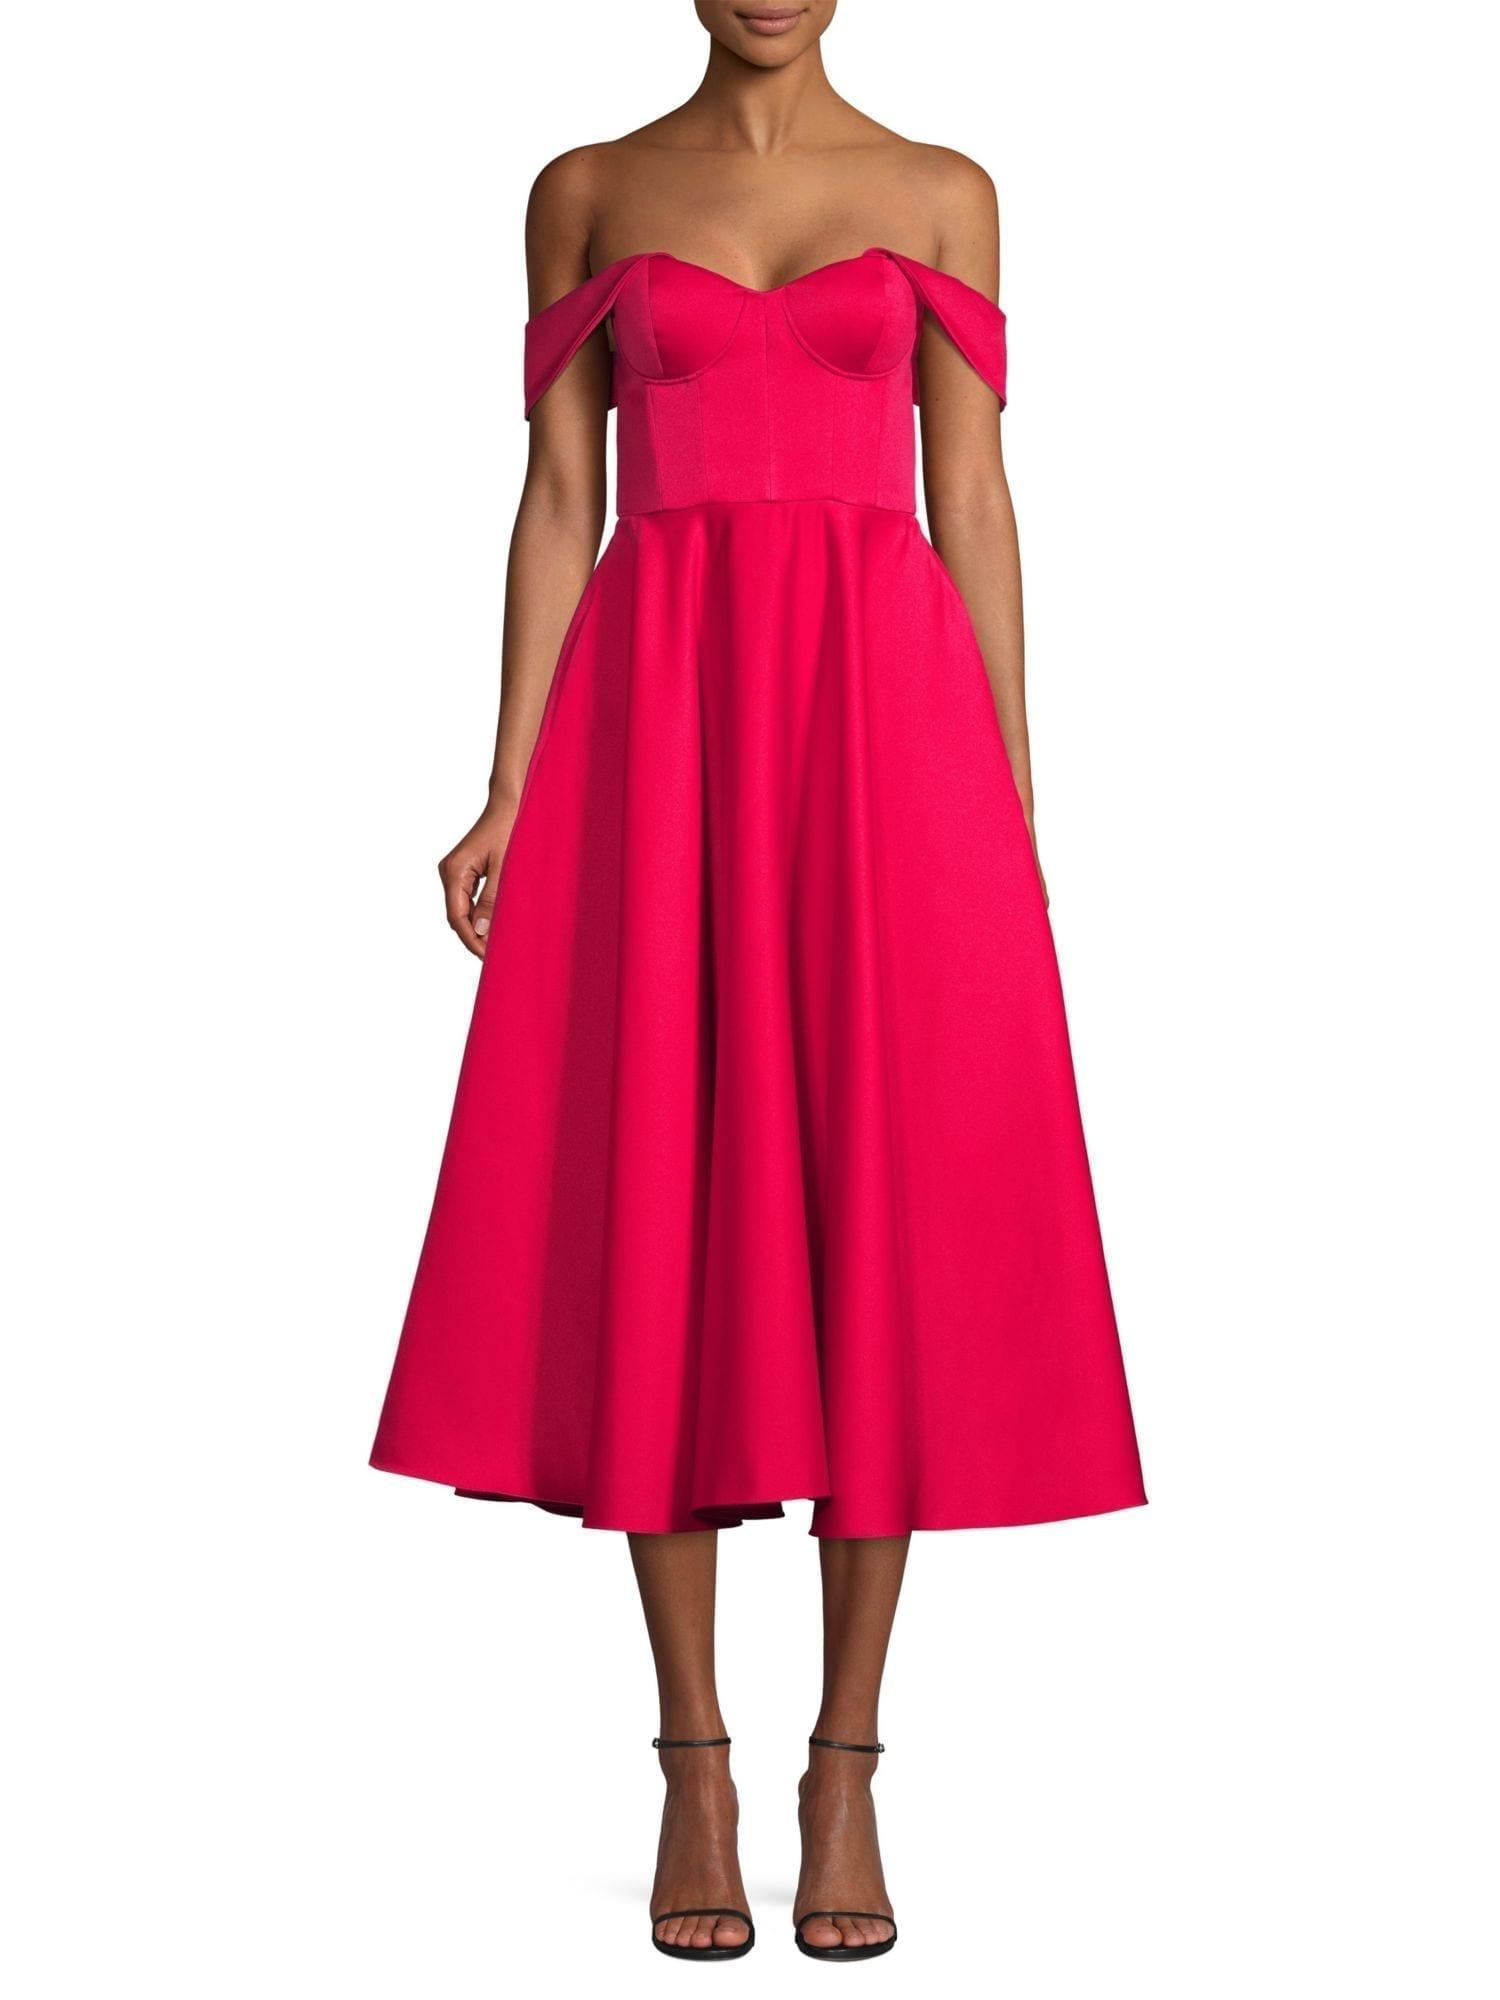 JAY GODFREY Charlie Off-The-Shoulder Cocktail Poppy Dress